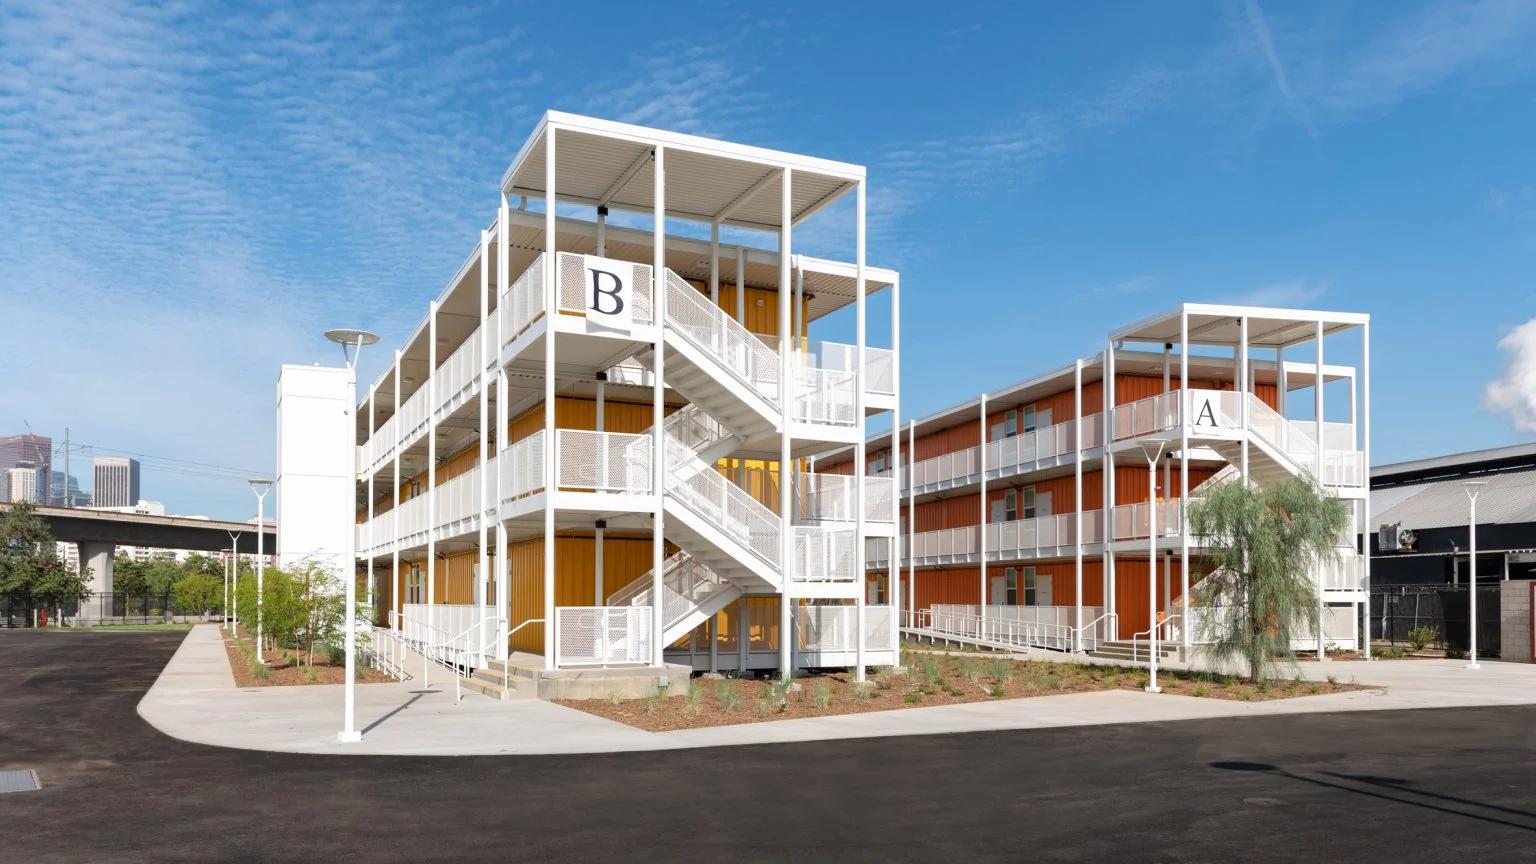 Dan Ursitti | NAC Architecture